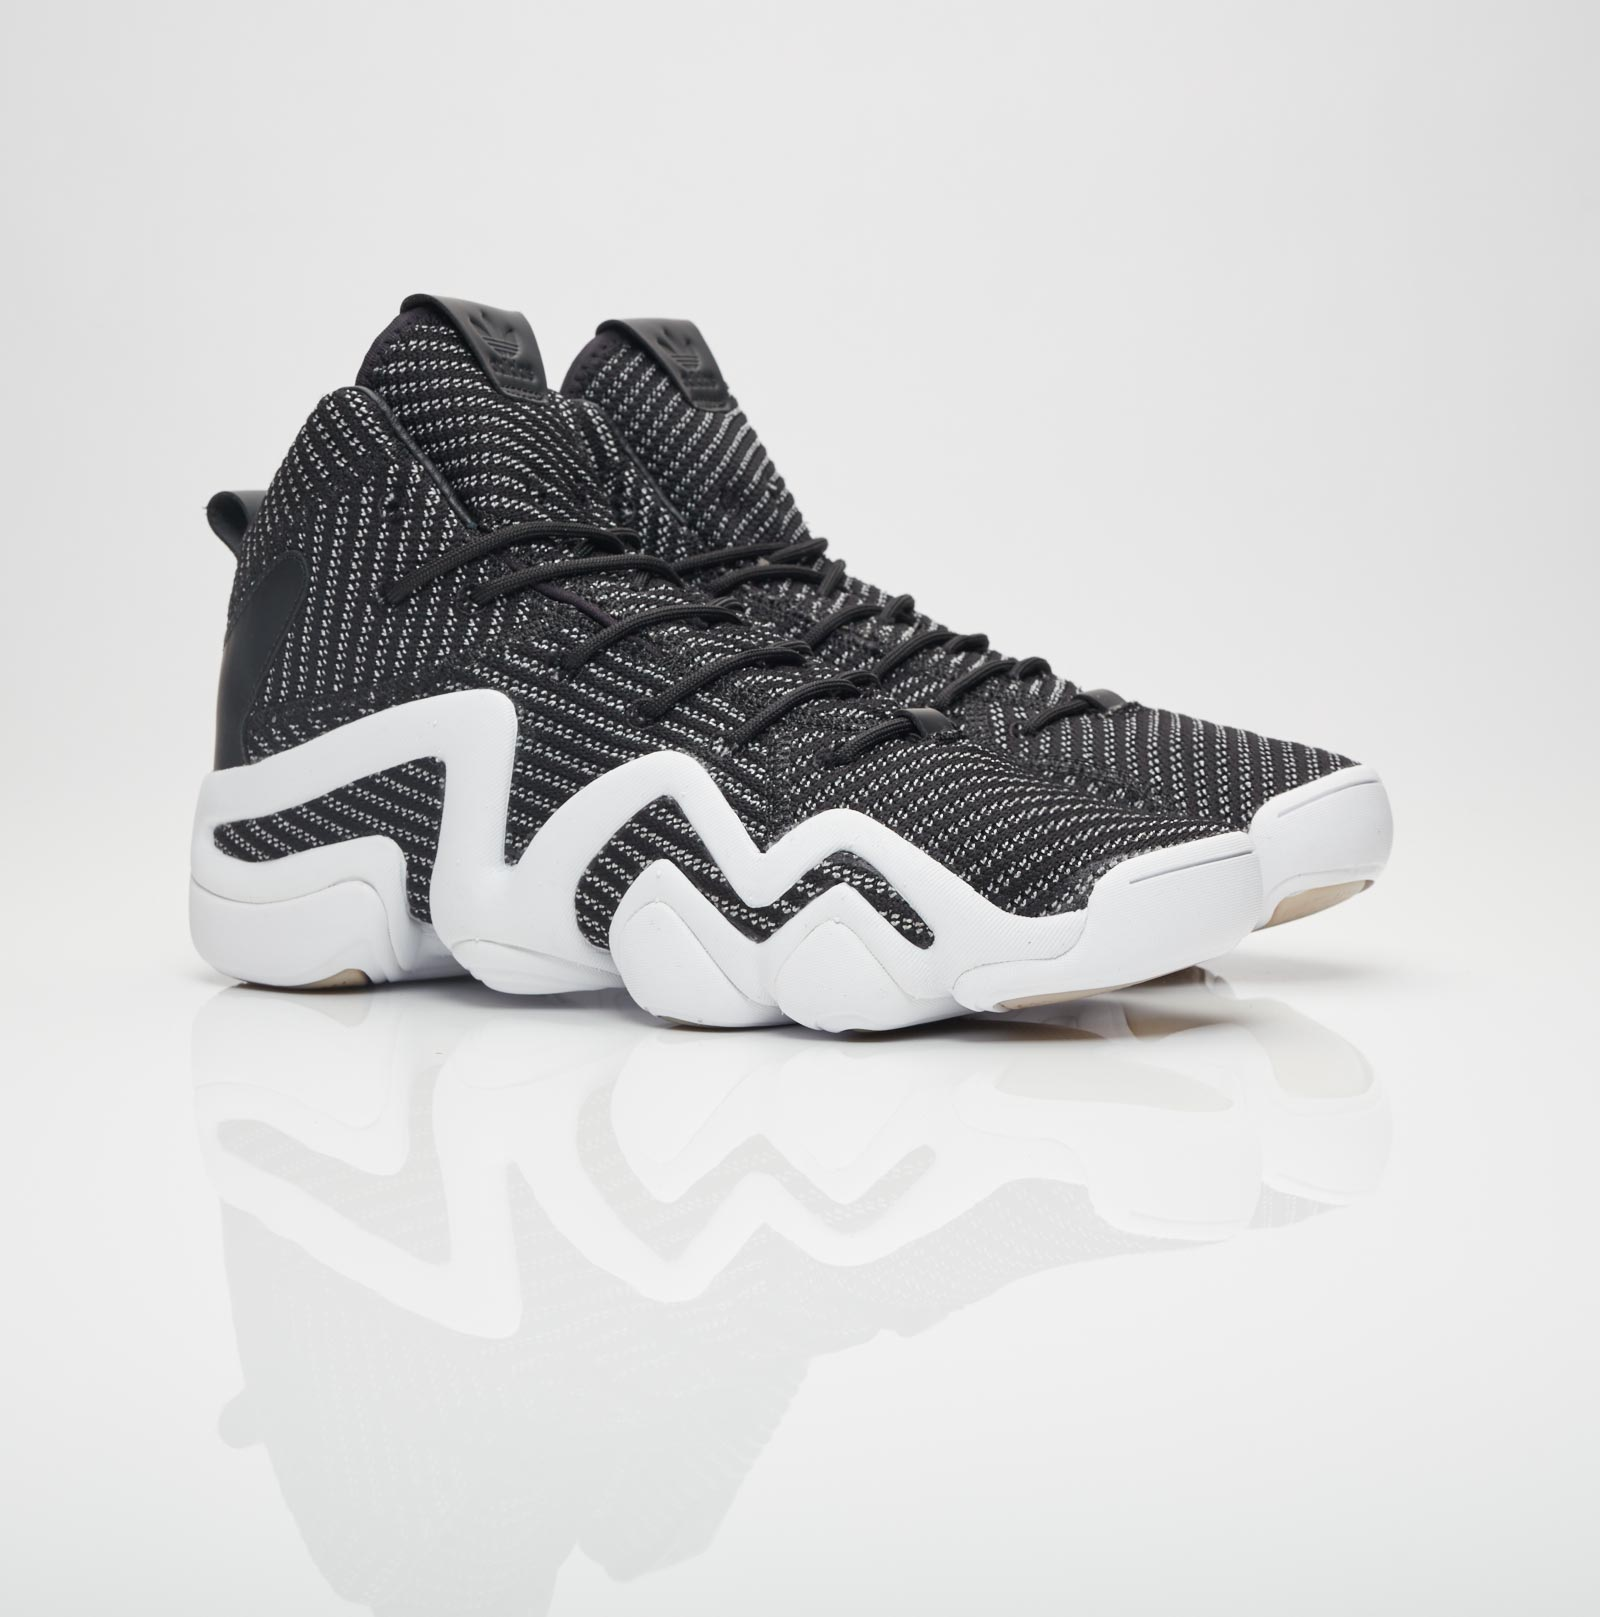 68b52a523e3 adidas Crazy 8 Adv Primeknit - By4423 - Sneakersnstuff